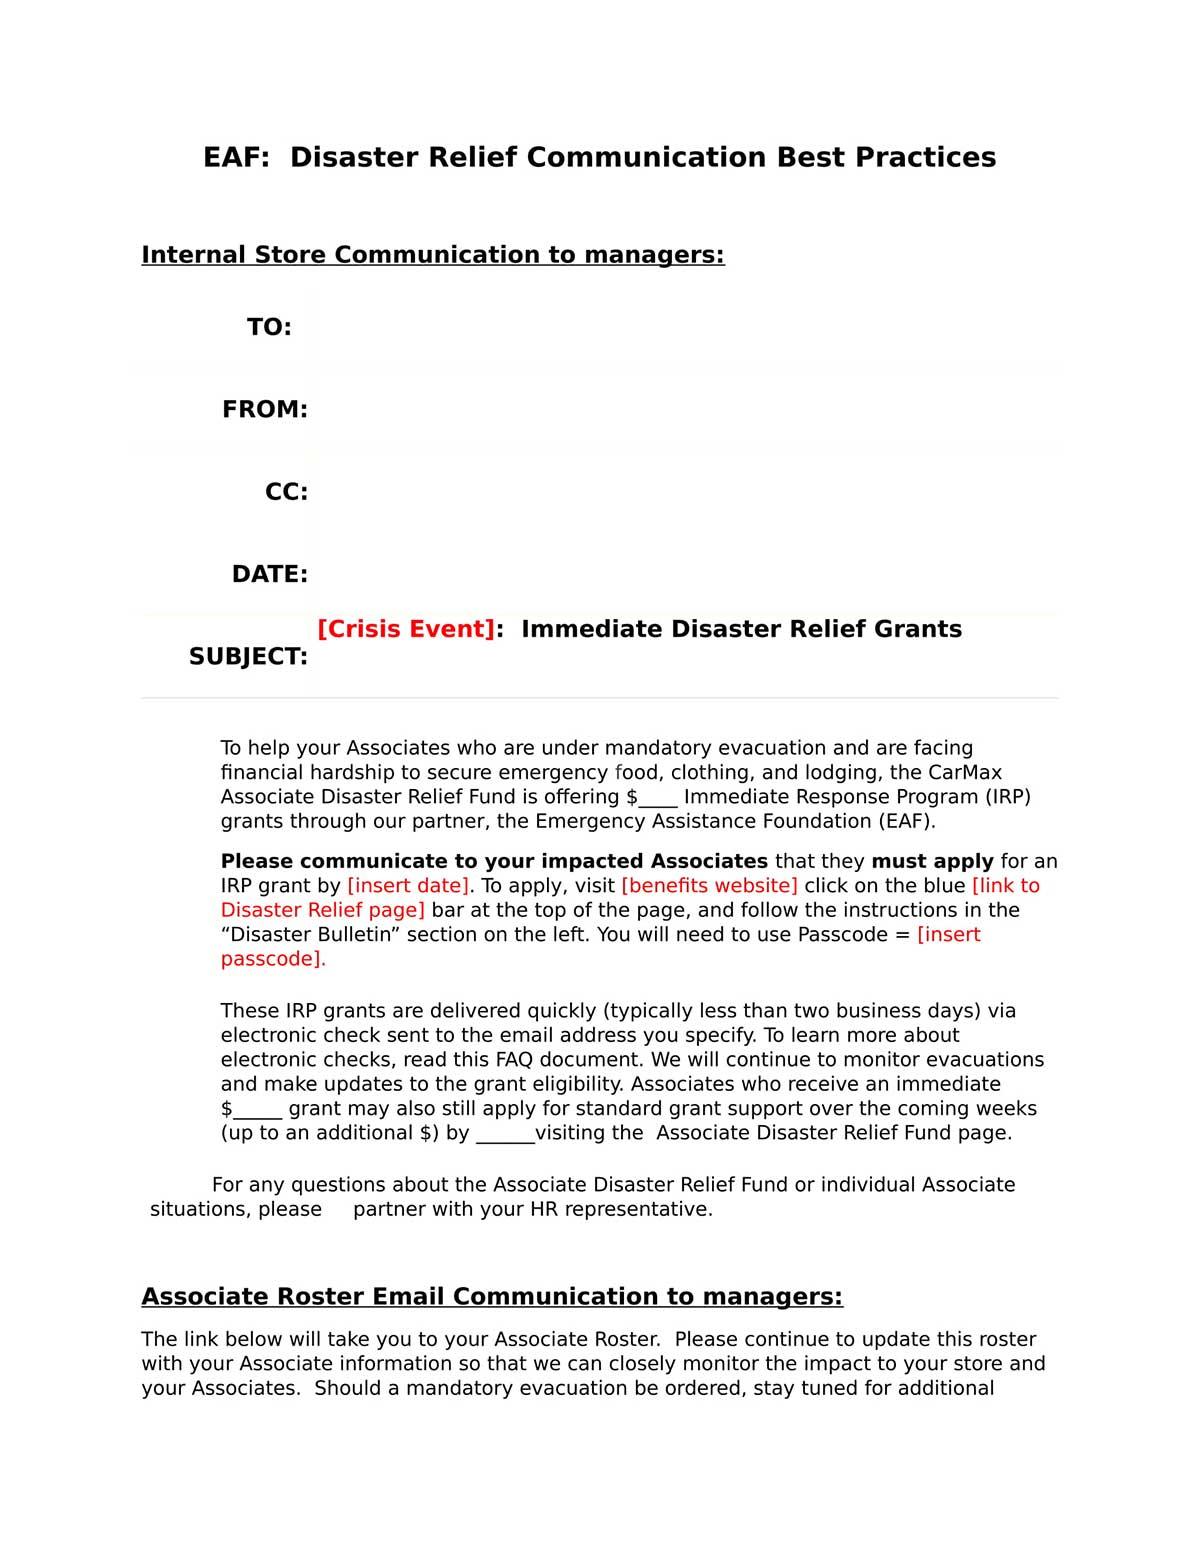 EAF-Communication-Best-Practices-1